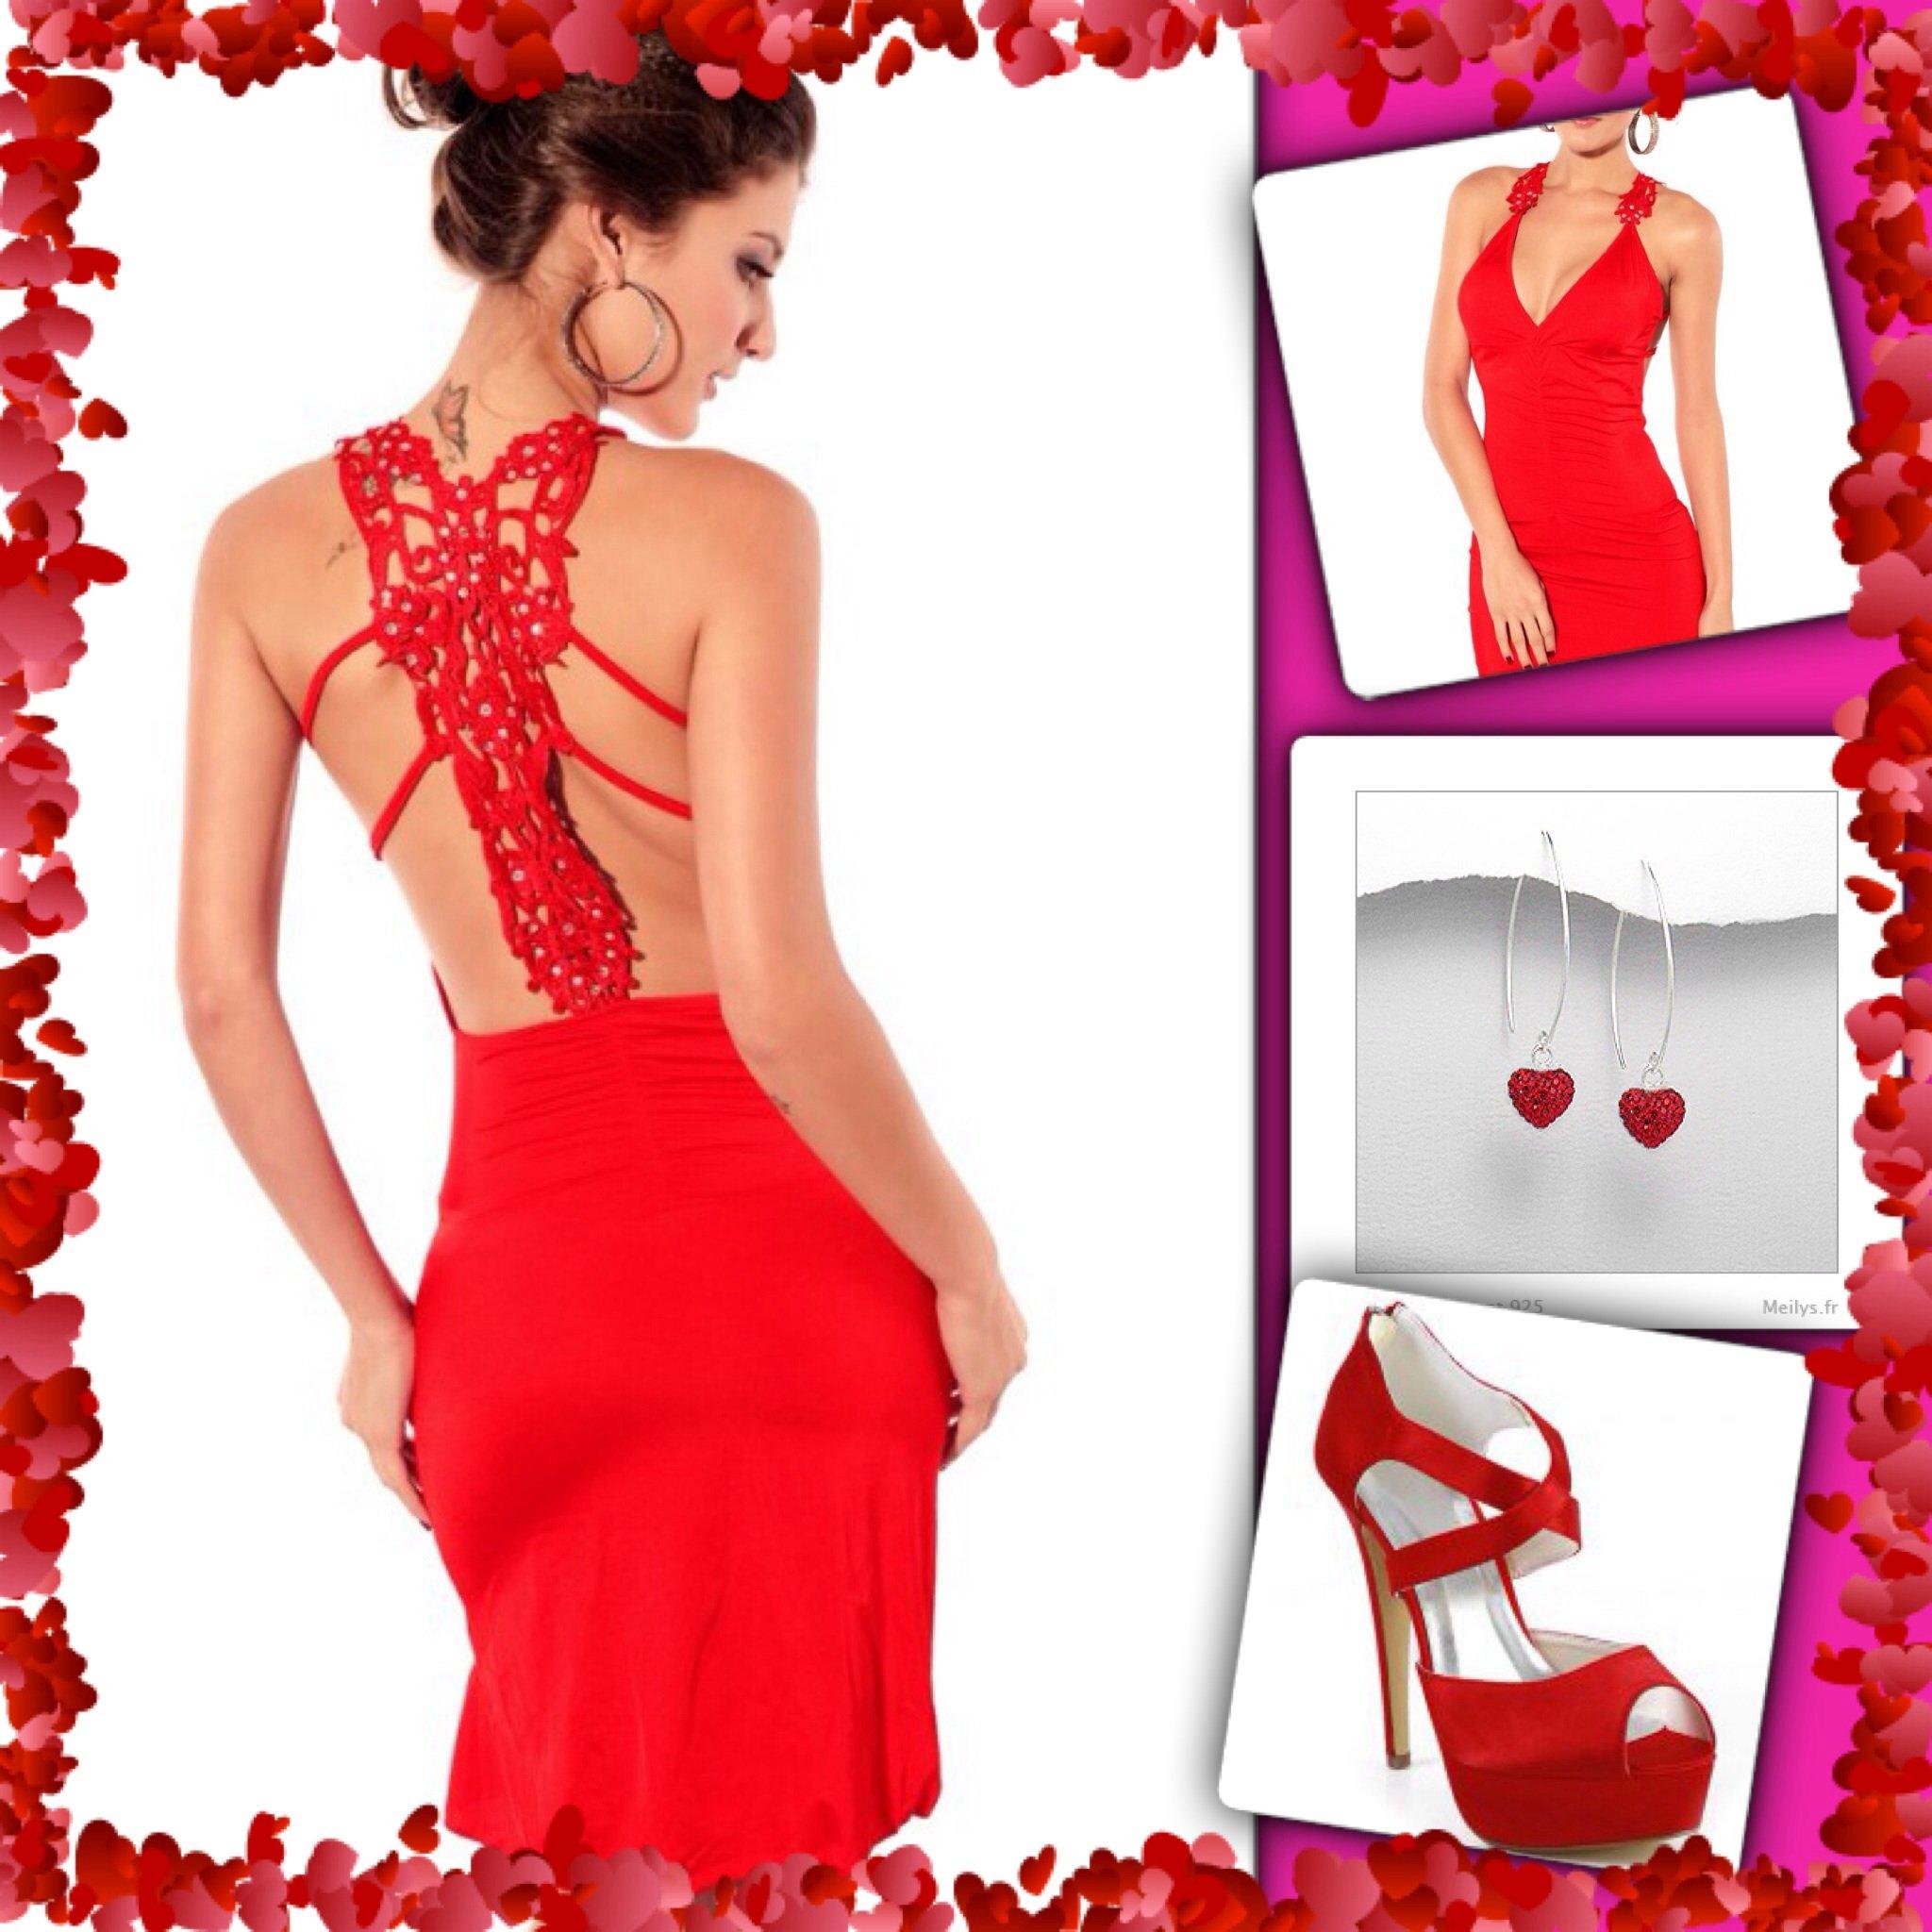 tenue glamour et sexy pour la st valentin cbella mon blog. Black Bedroom Furniture Sets. Home Design Ideas